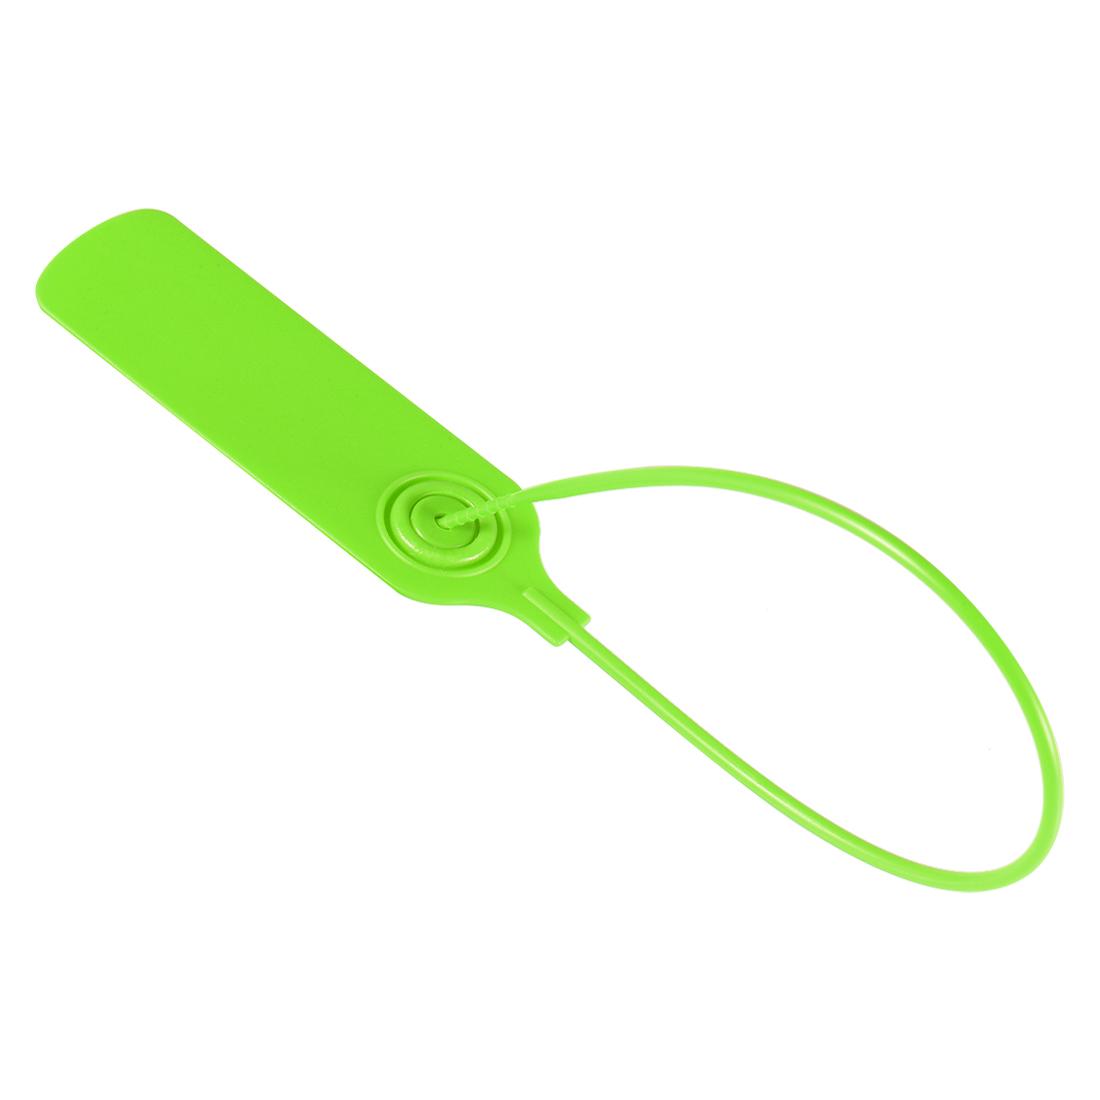 Plastic Zip Ties Seals Anti-Tamper 300mm Length, Green, Pack of 50